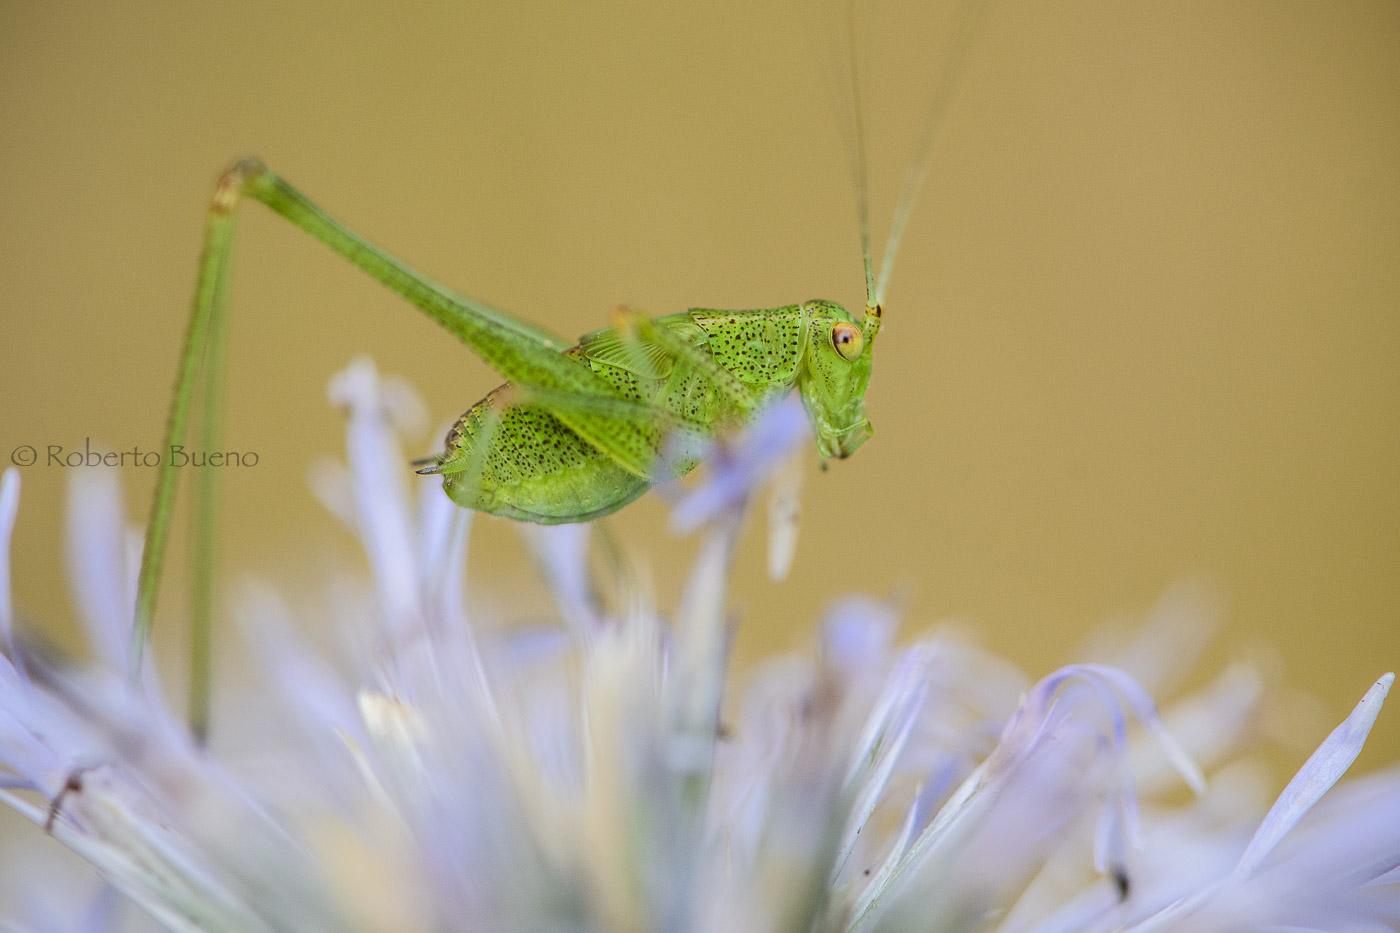 1 centímetro de verde vida